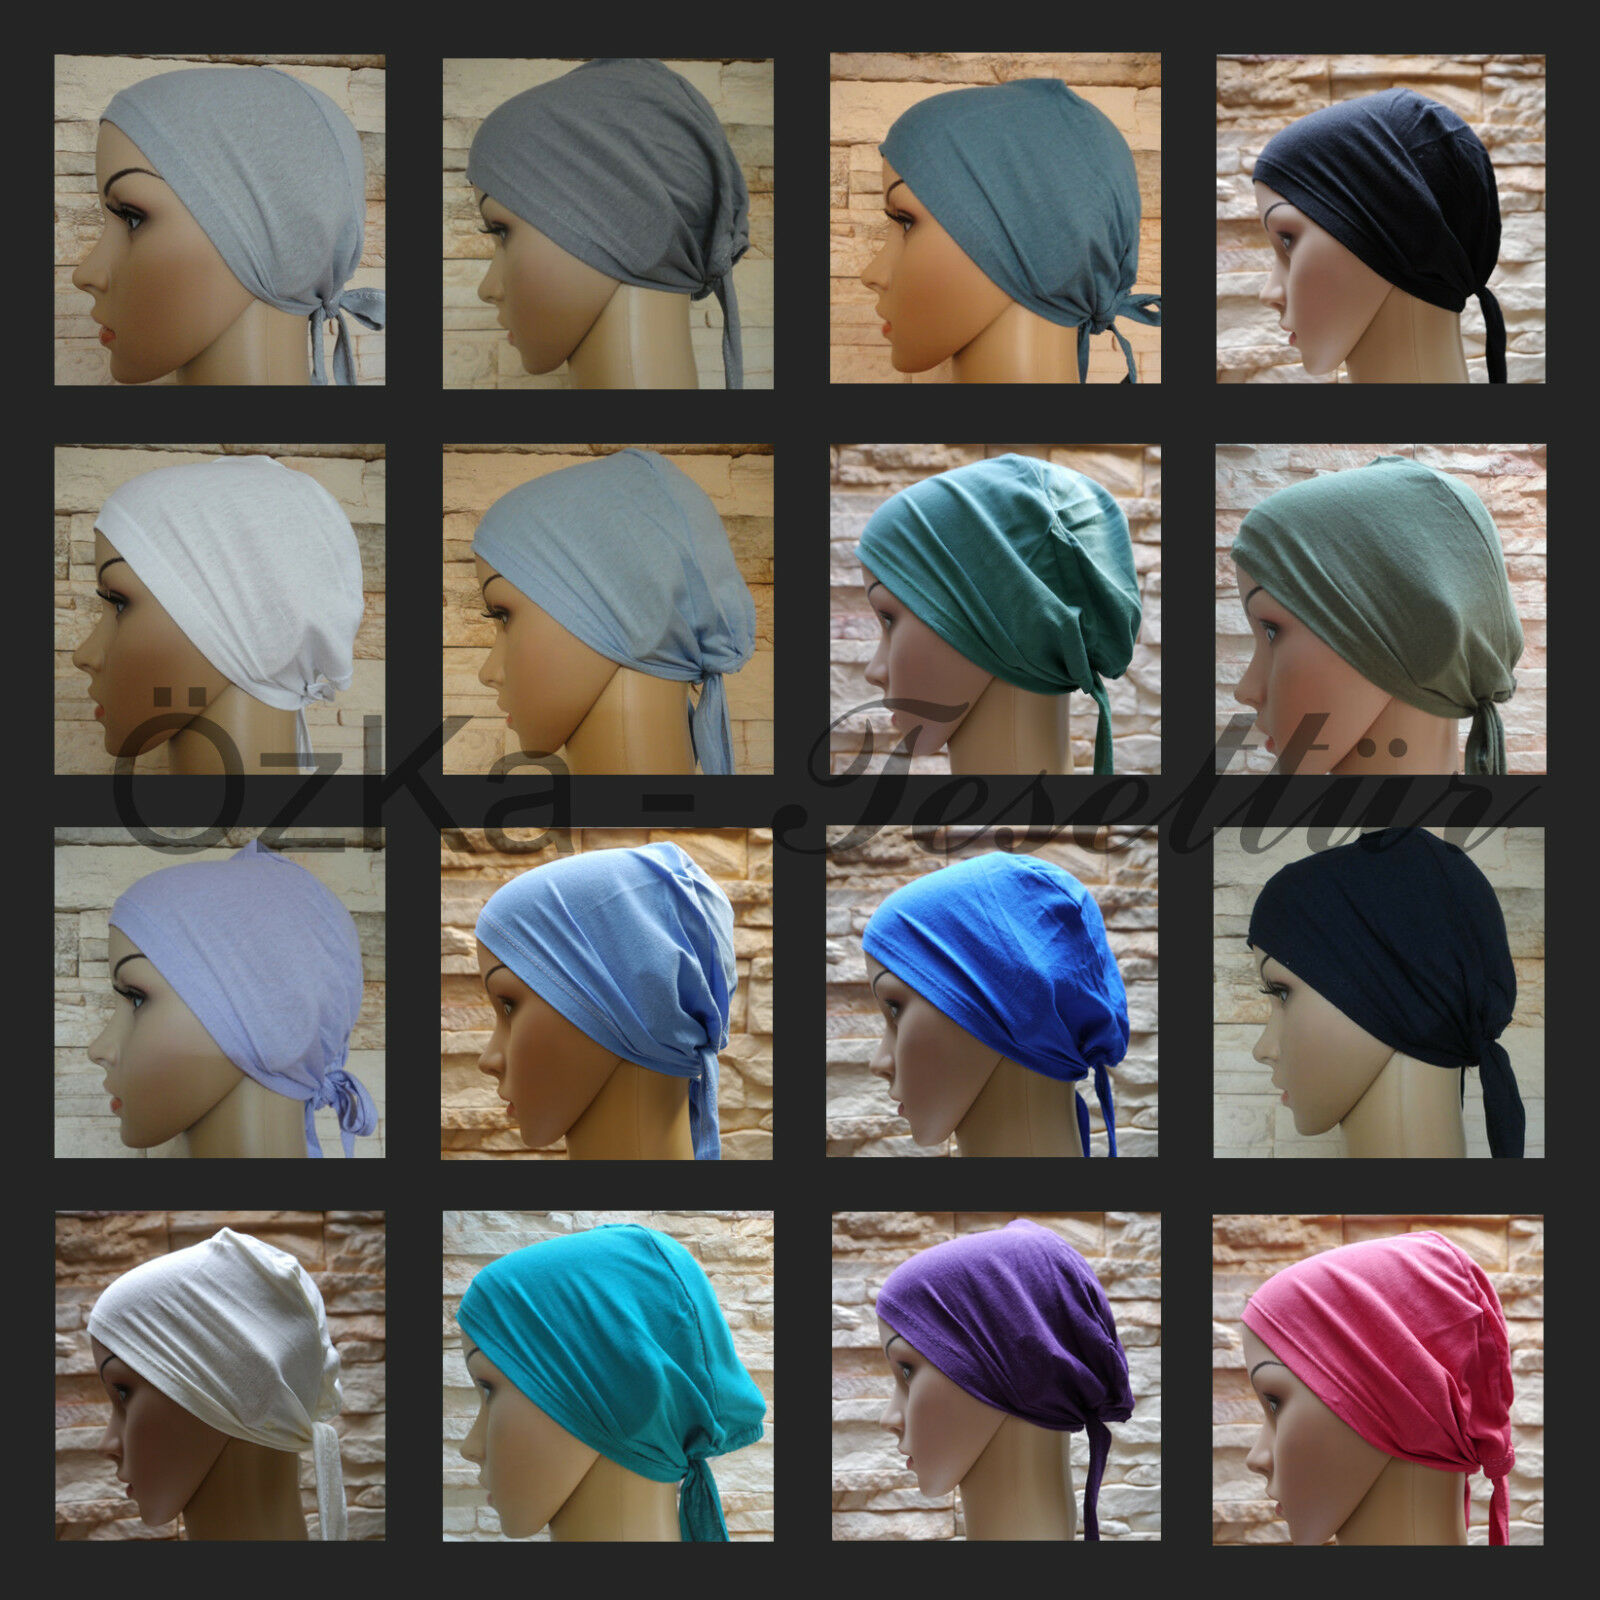 BONE Untertuch Bandana Tuch Kopftuch Hijab Tesettür Esarp Baumwolle Bonnet Scarf